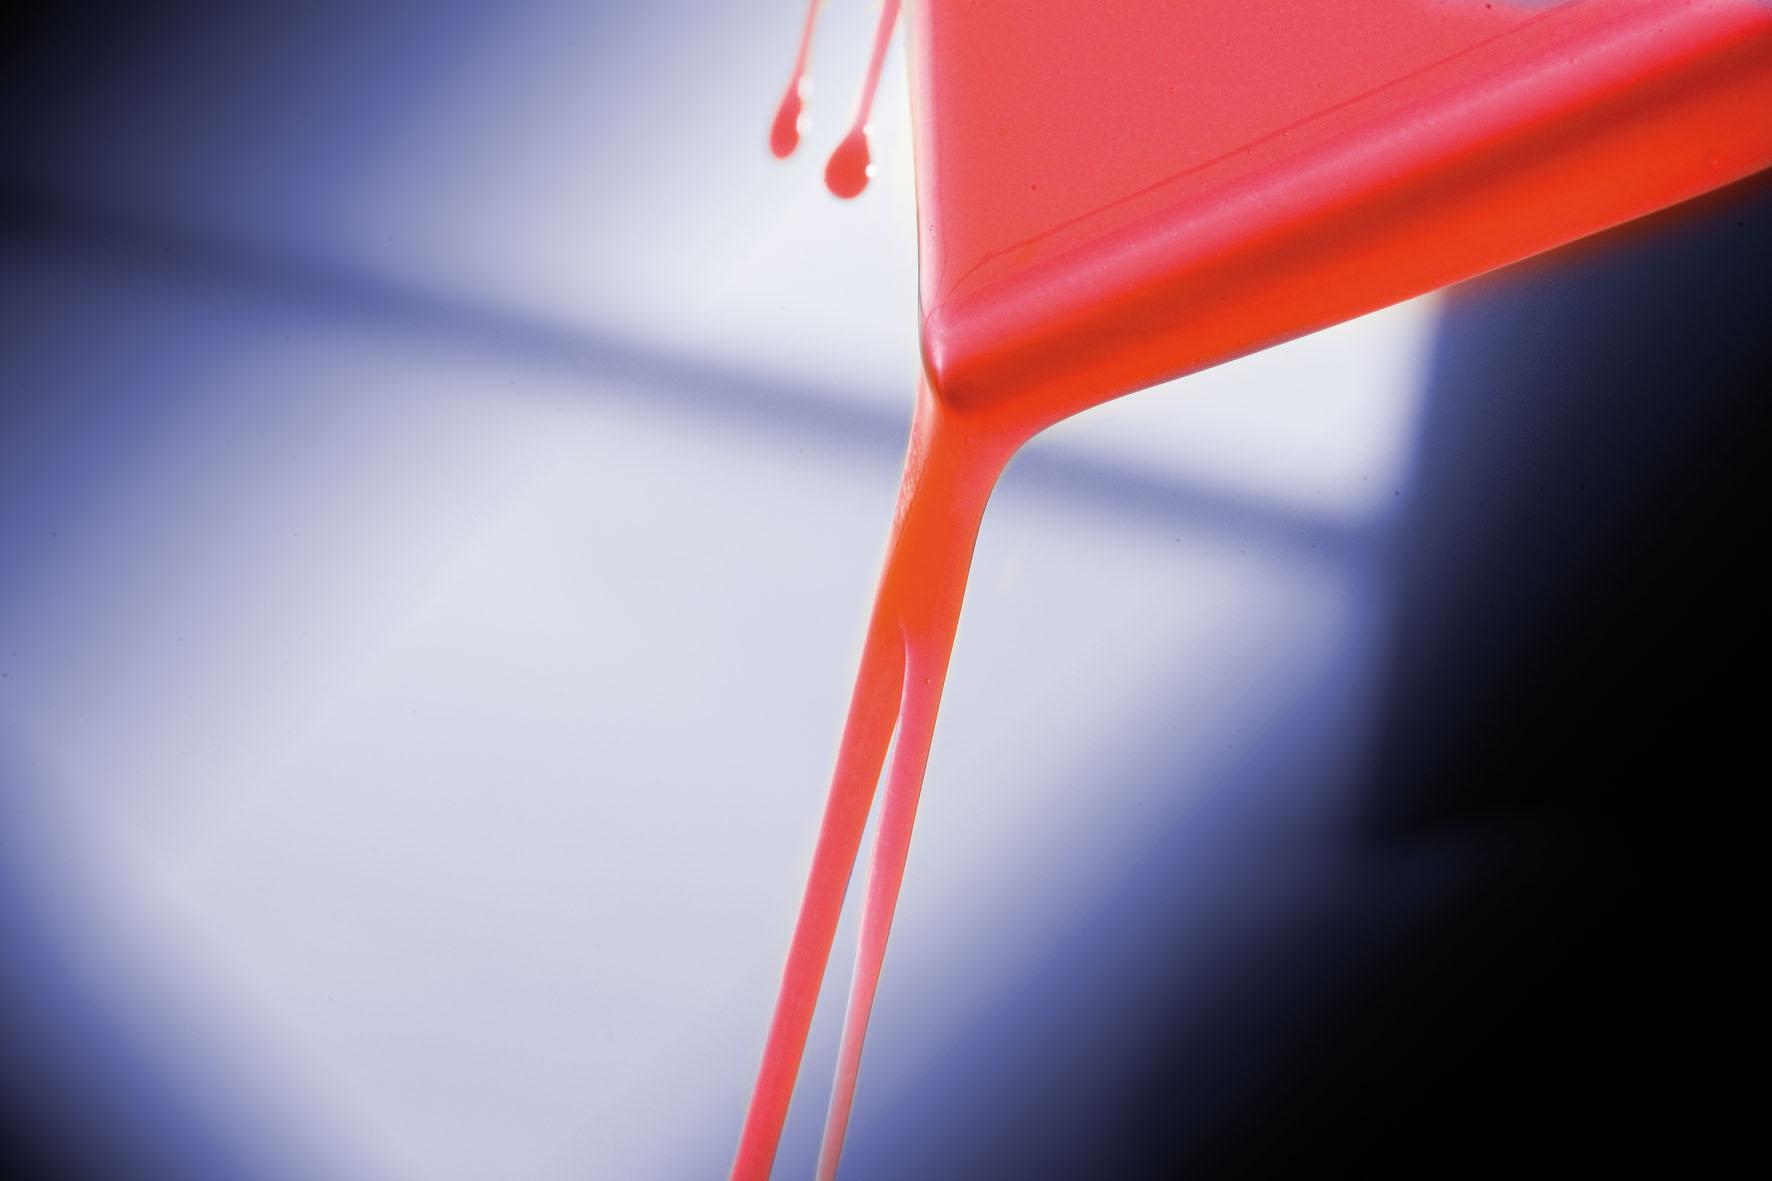 rheological testing of the sagging behaviour of coatings